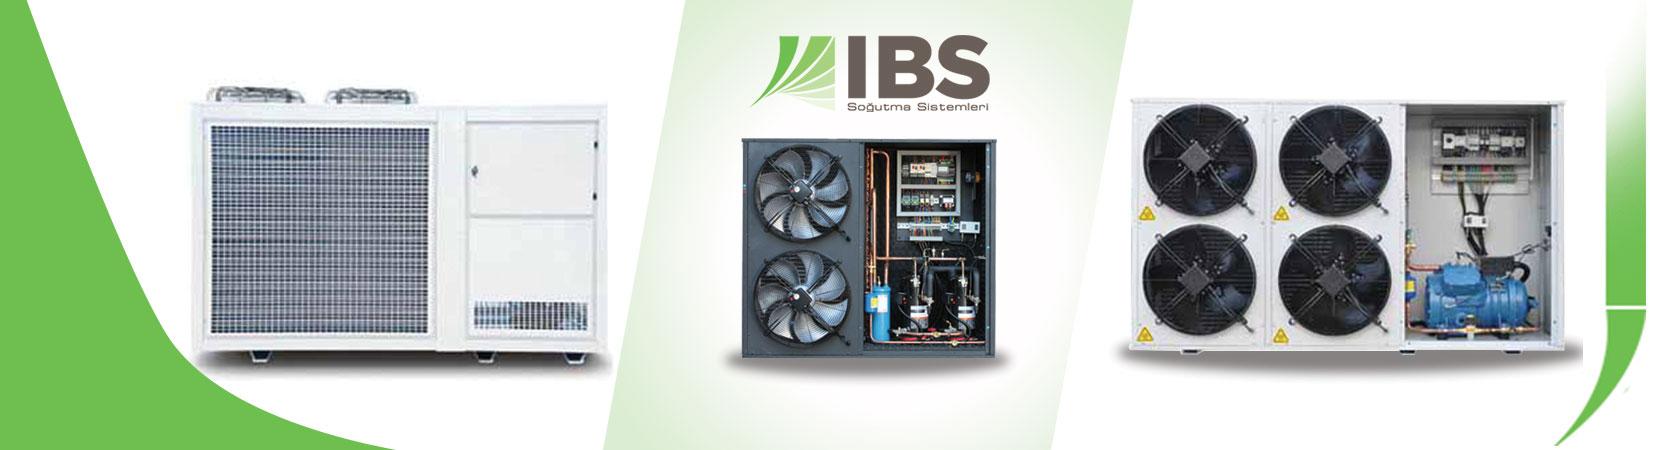 Хладилни агрегати <br><strong>на фирма IBS</strong>